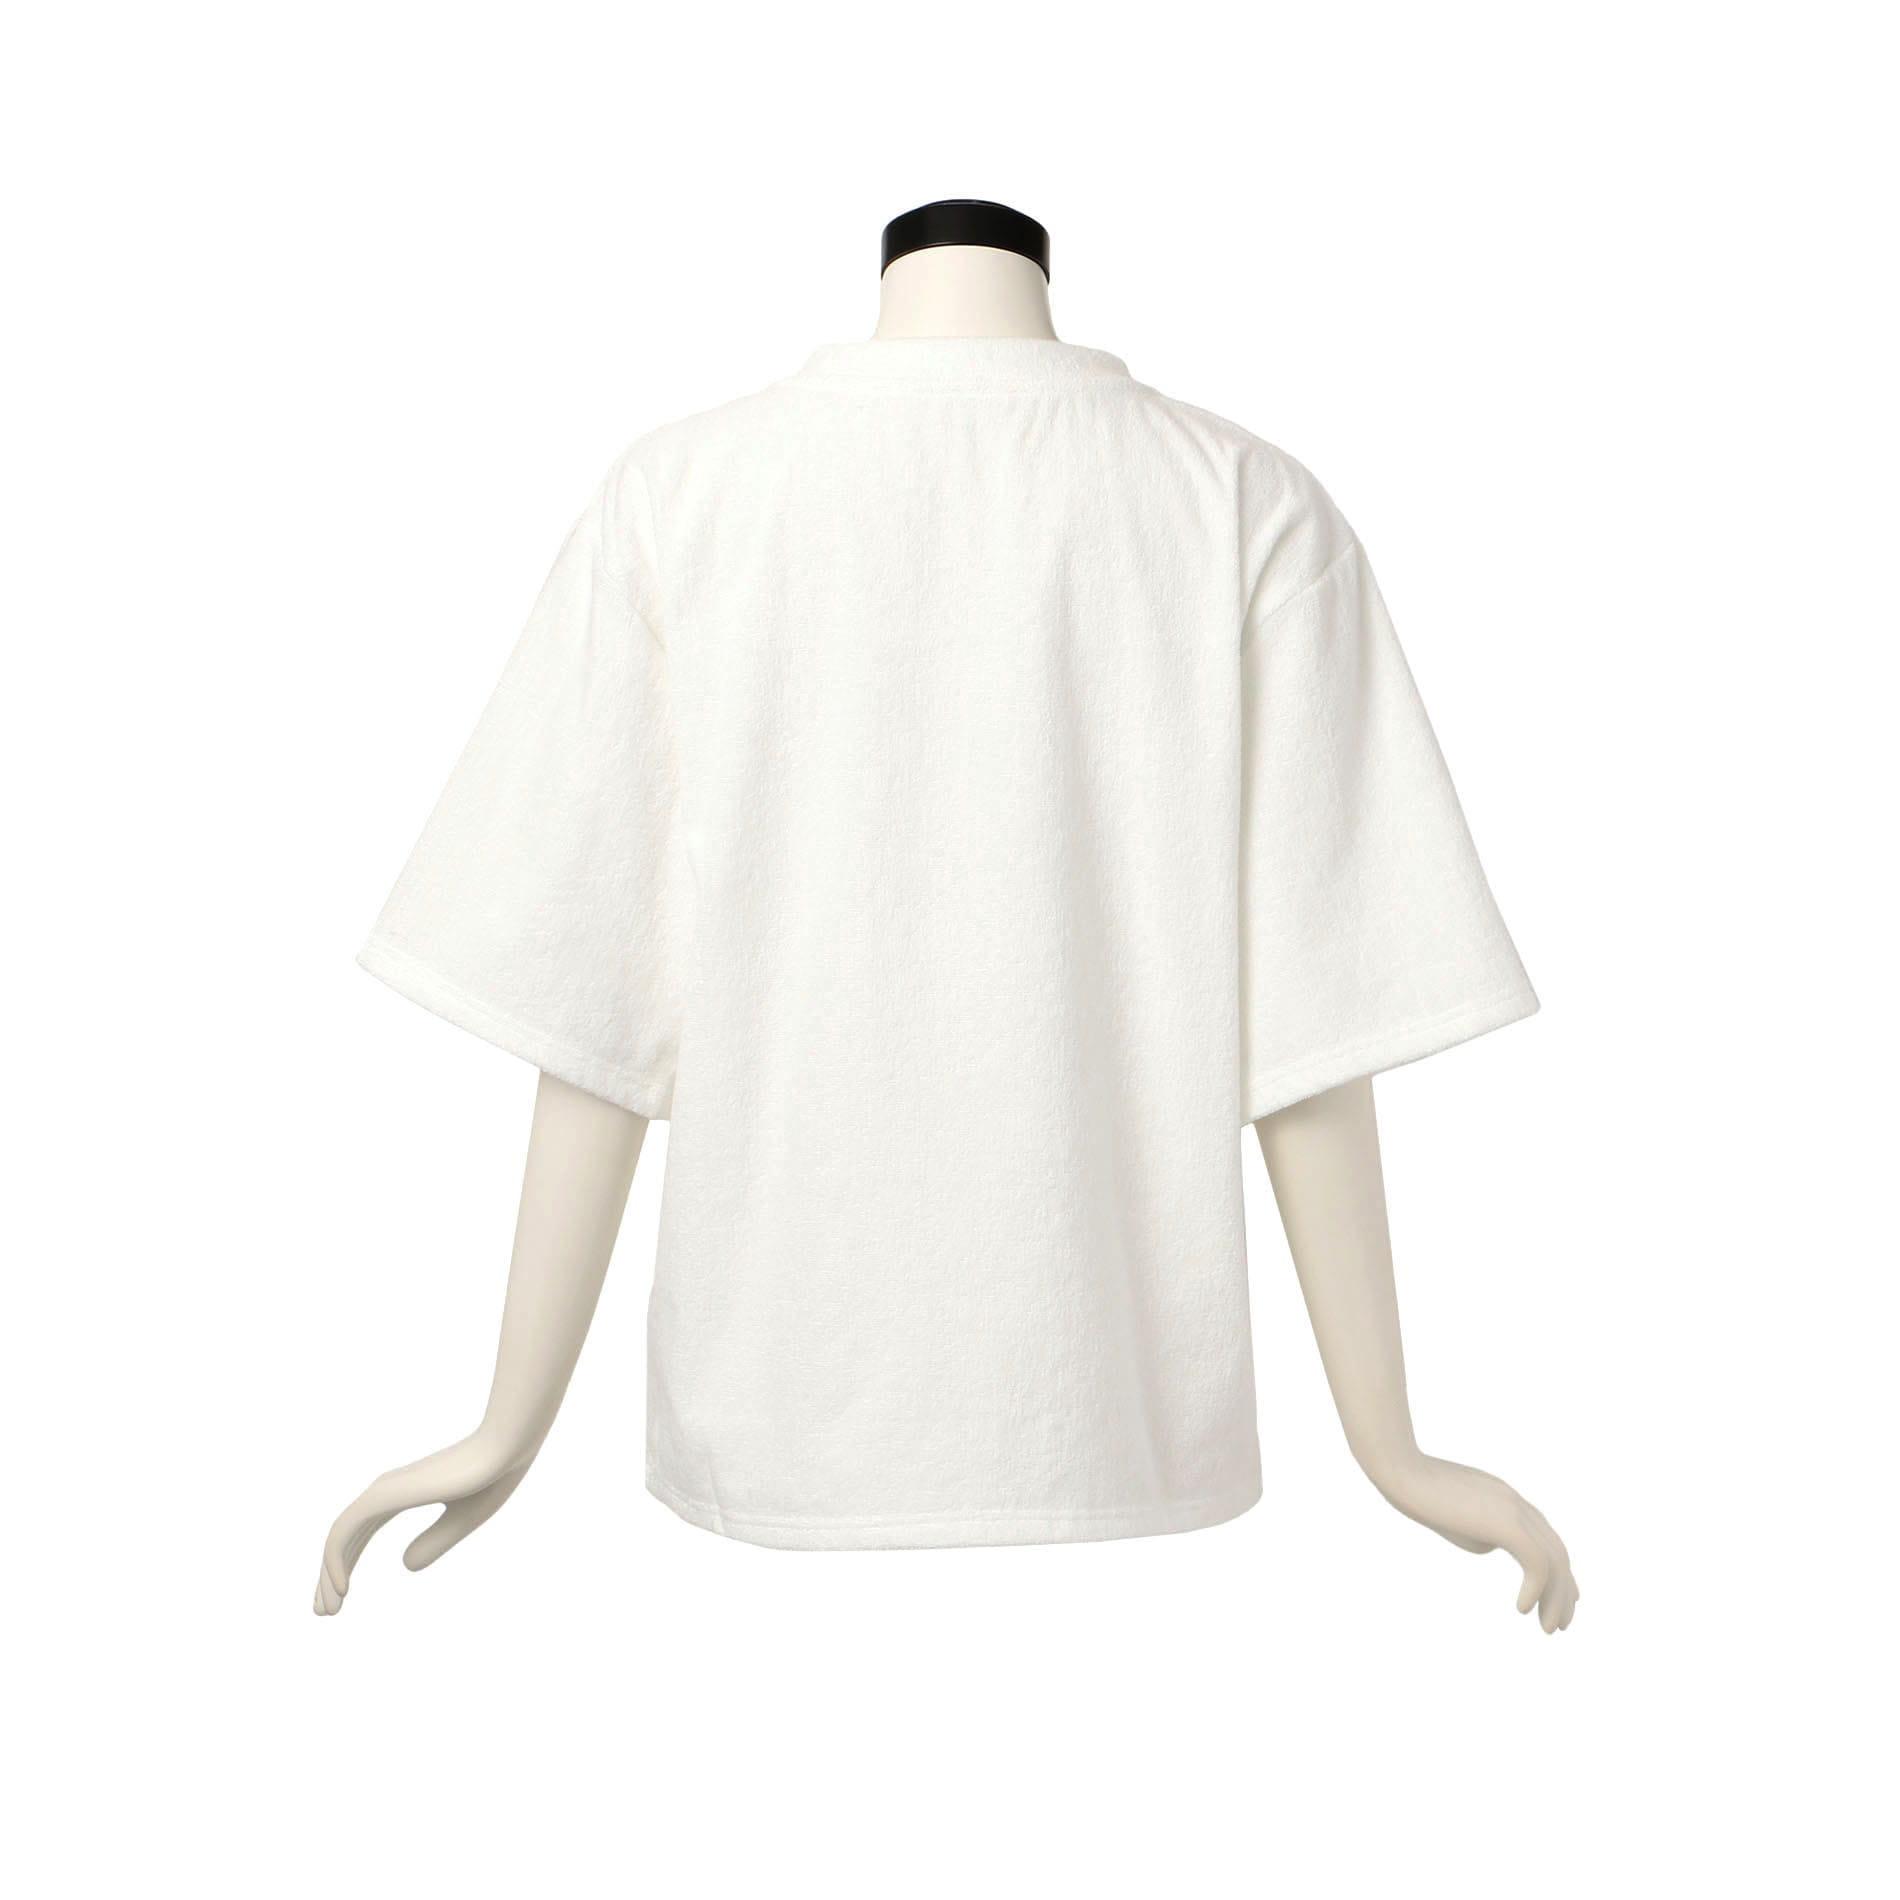 【LeRELN】WOMEN パイル Tシャツ